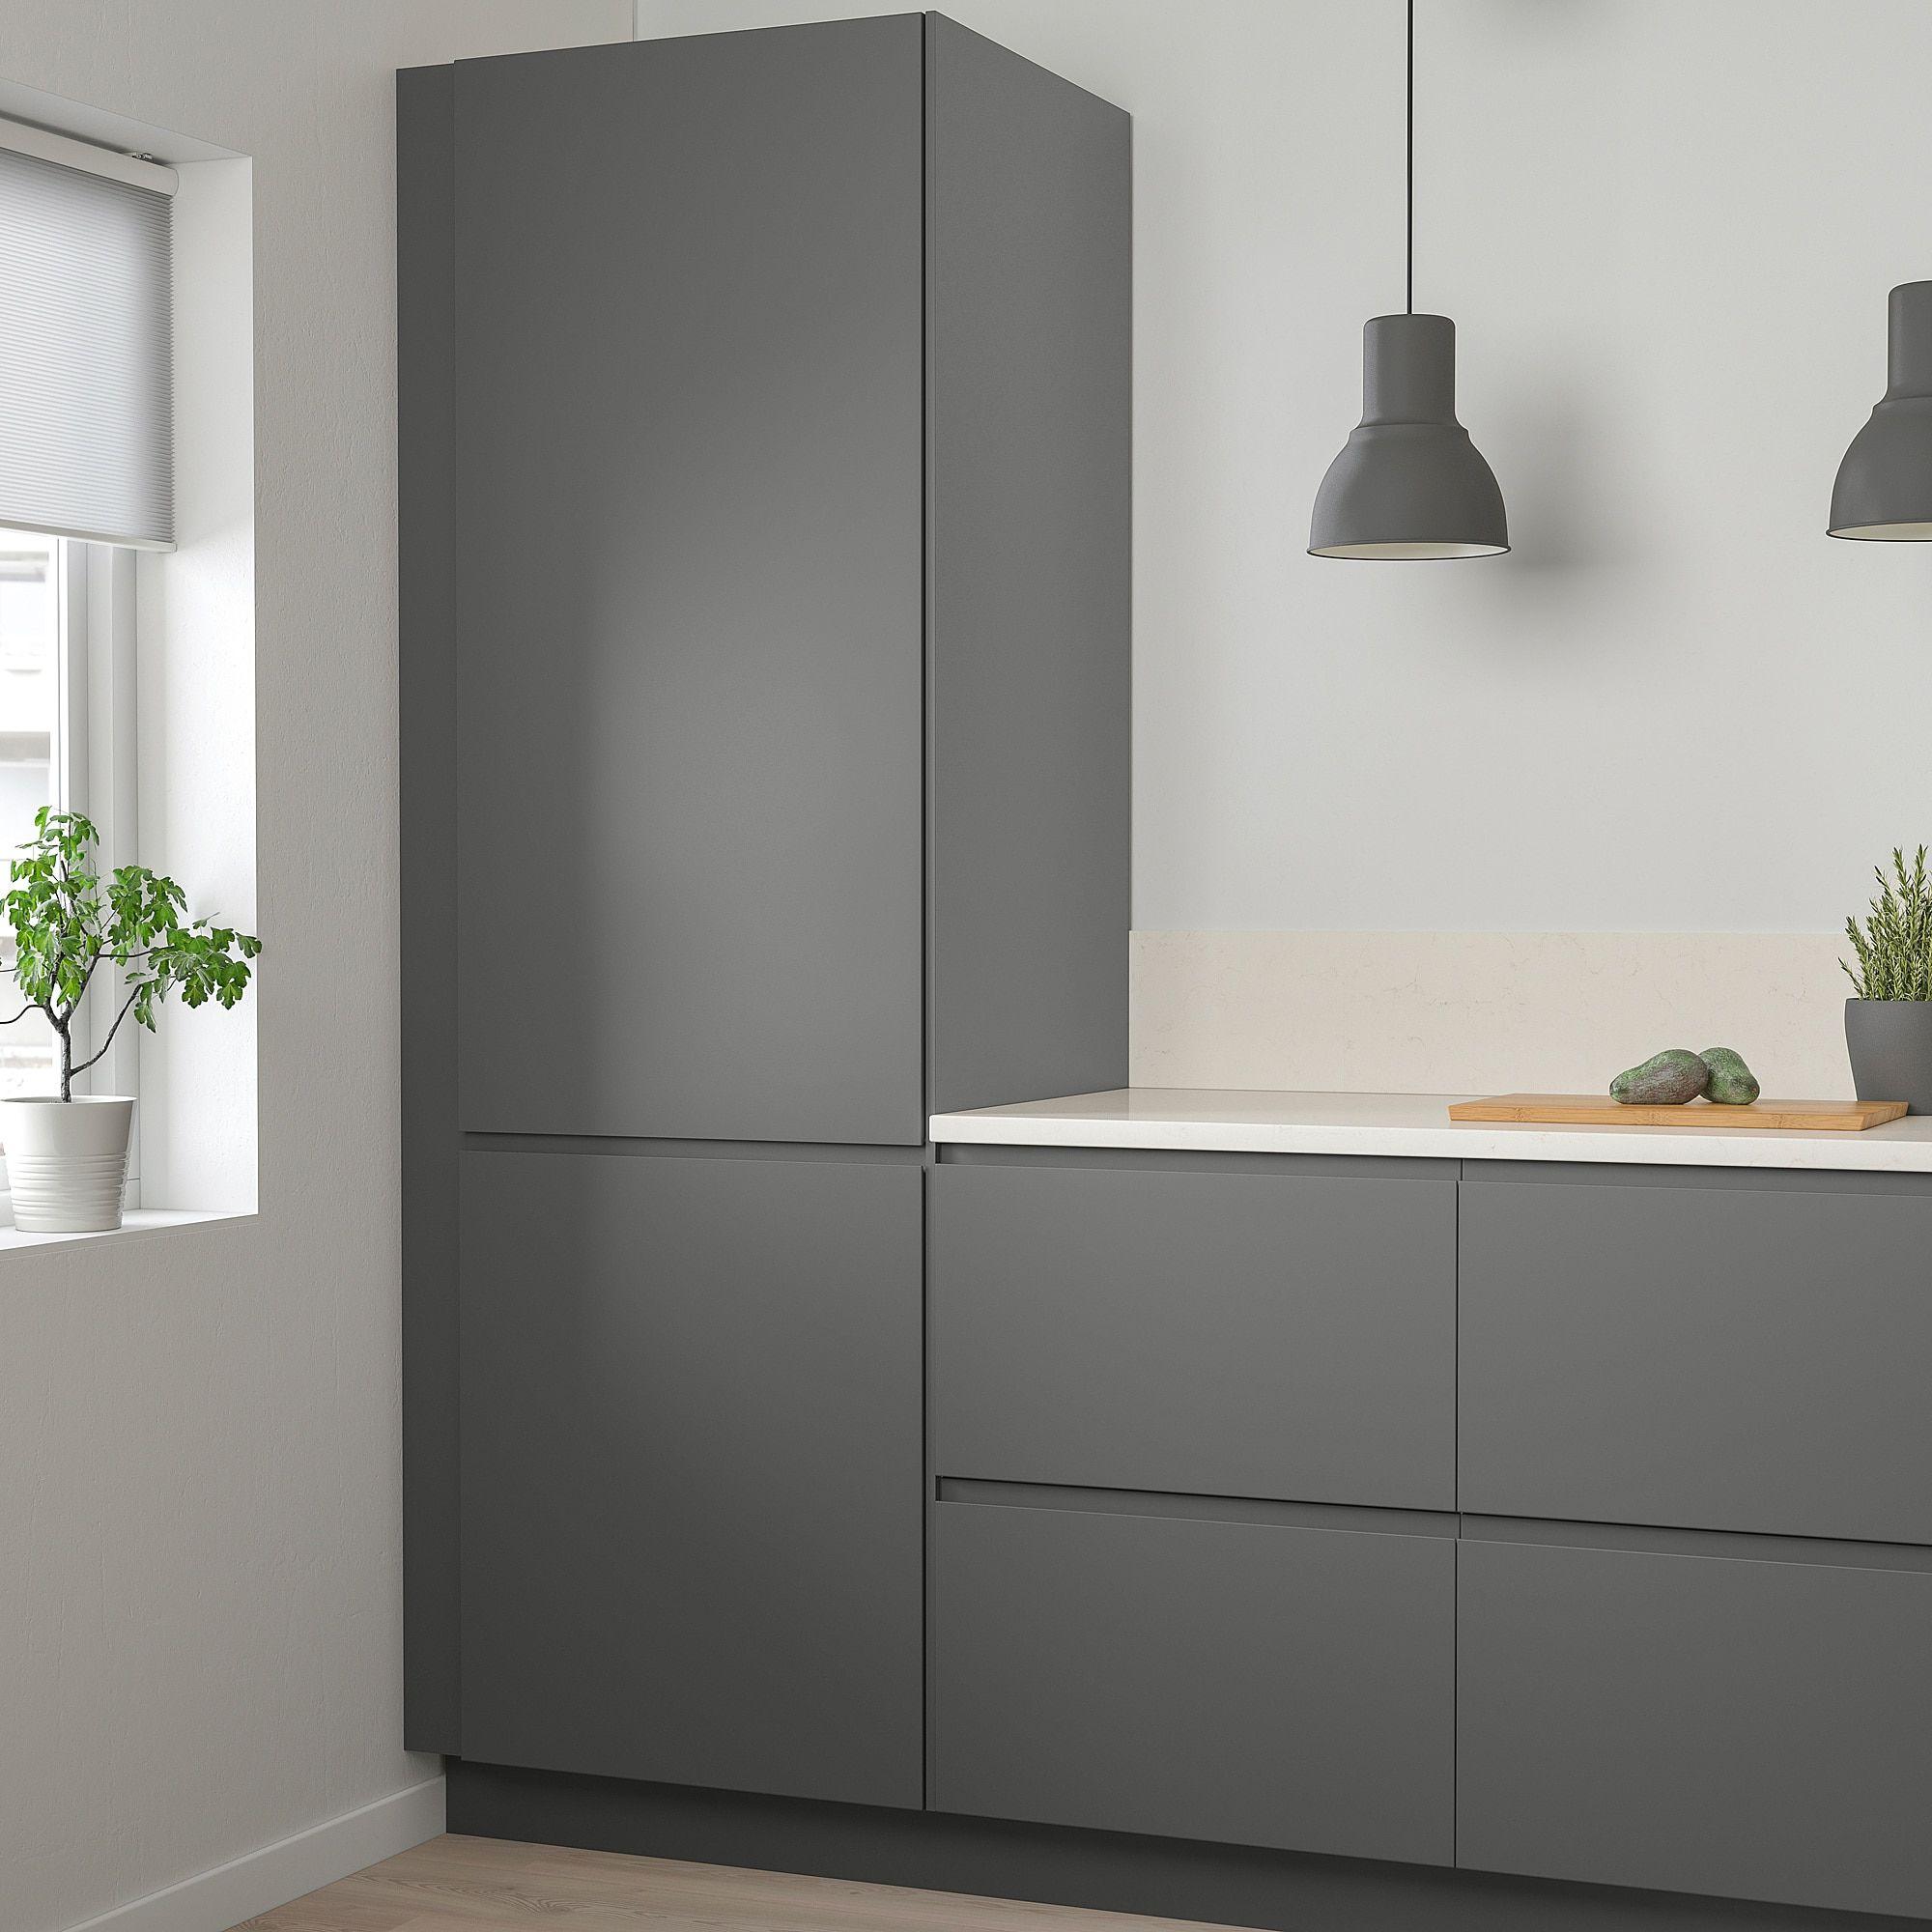 Ikea Küche Metod Test  Deko Ideen Badezimmer  Veranda